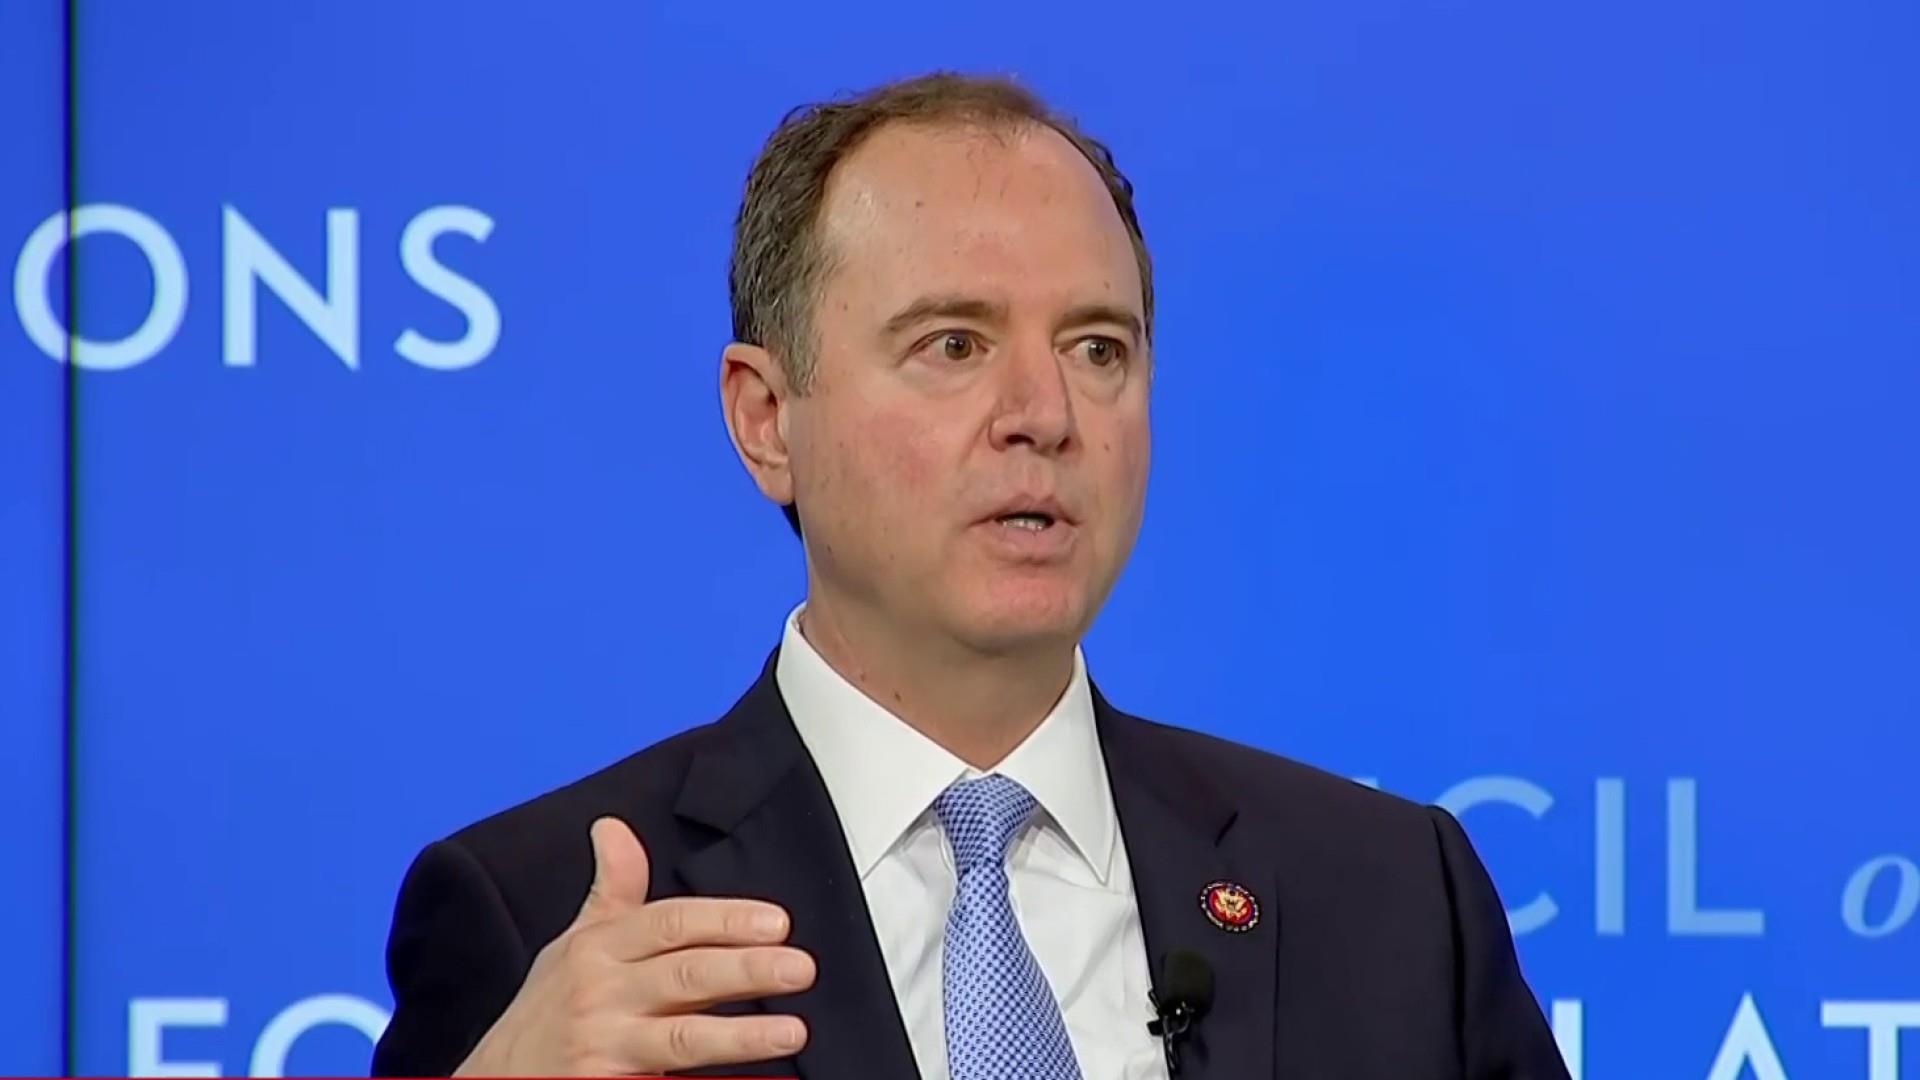 Dem Rep: Mueller must testify 'immediately,' will be subpoenaed